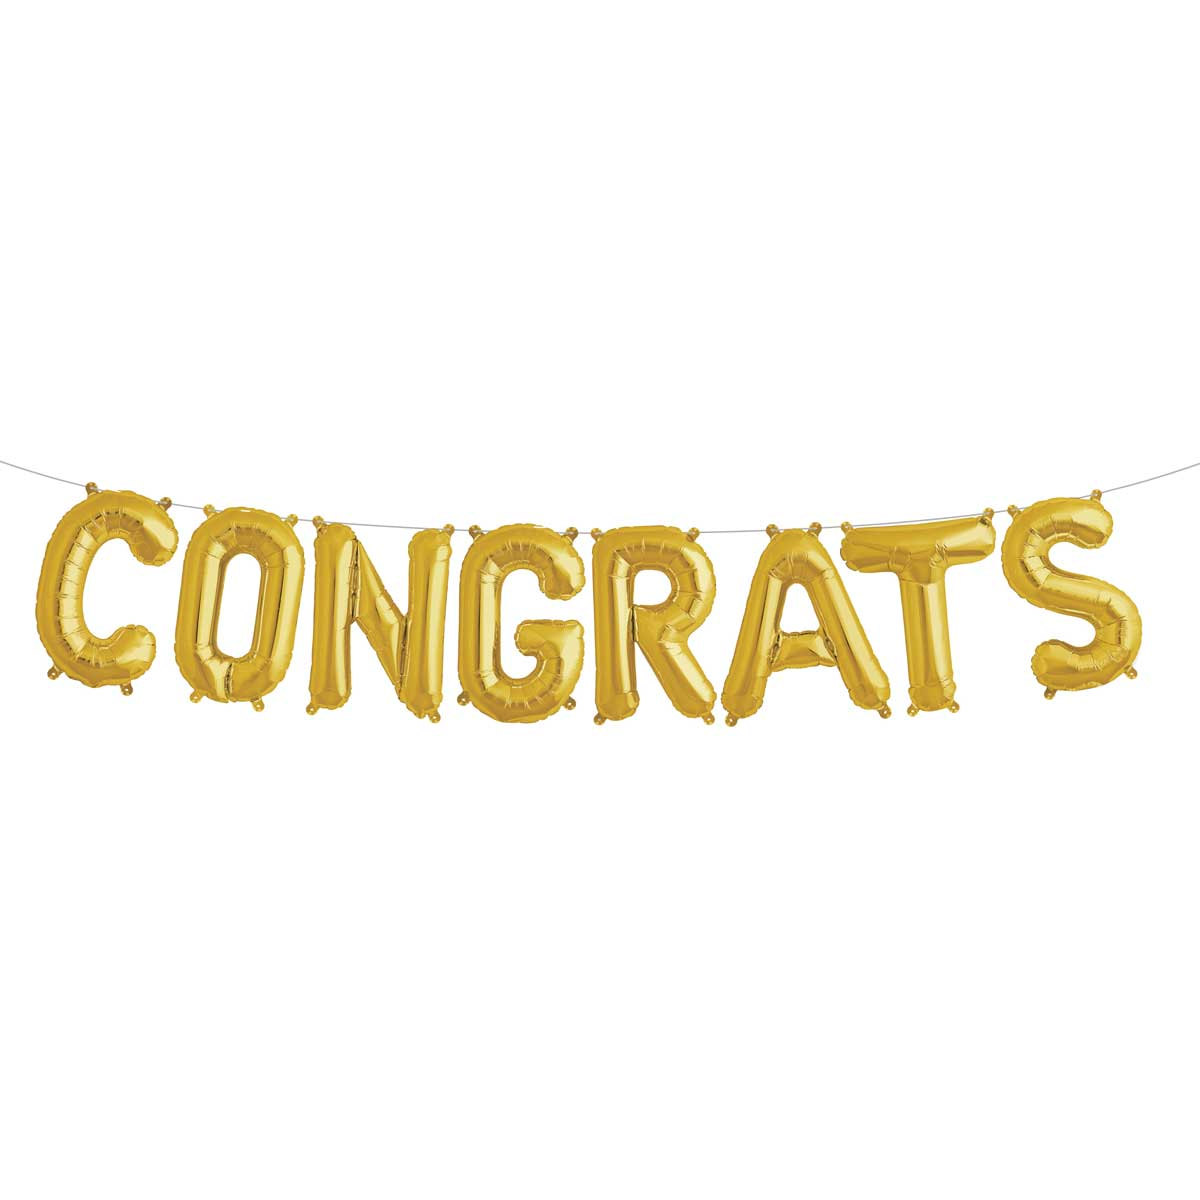 Congratulations clipart principal's. To our new principals